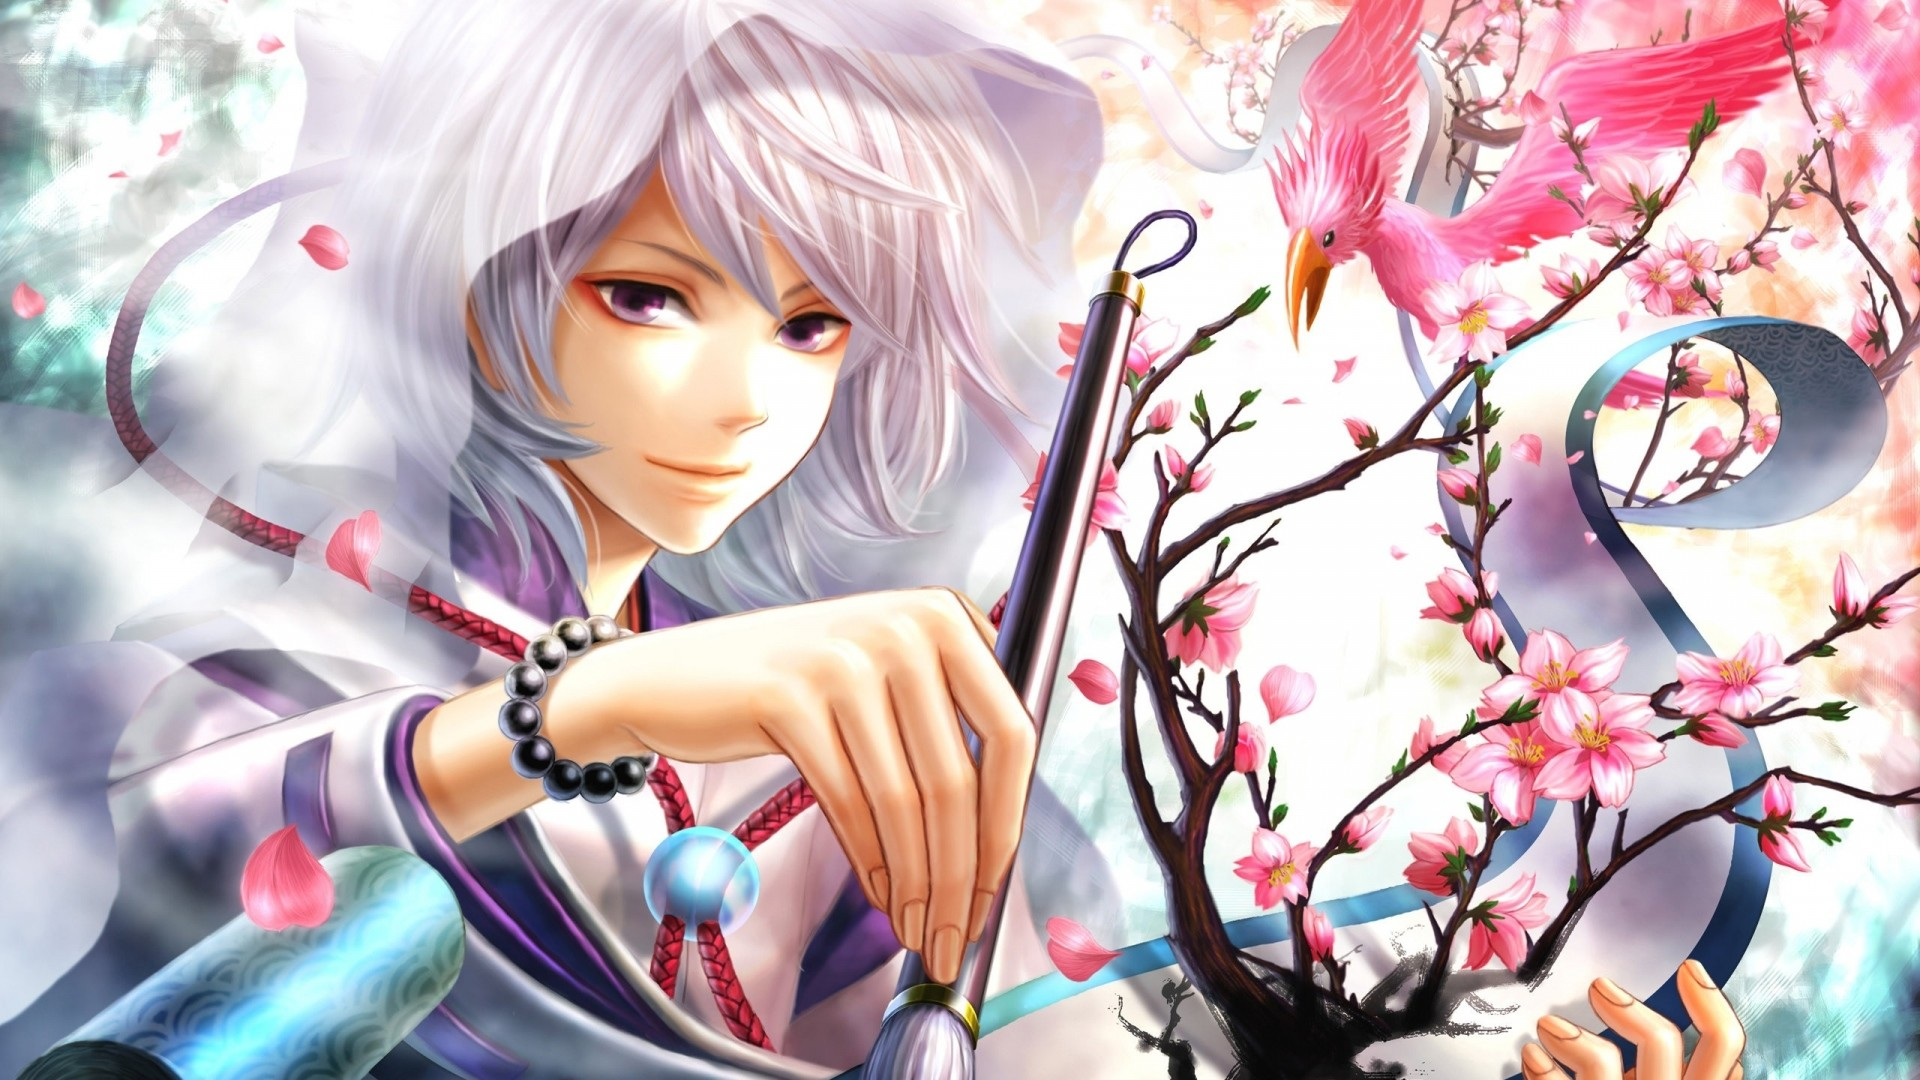 Wallpaper anime, girl, hood, brush, painting, drawing, art